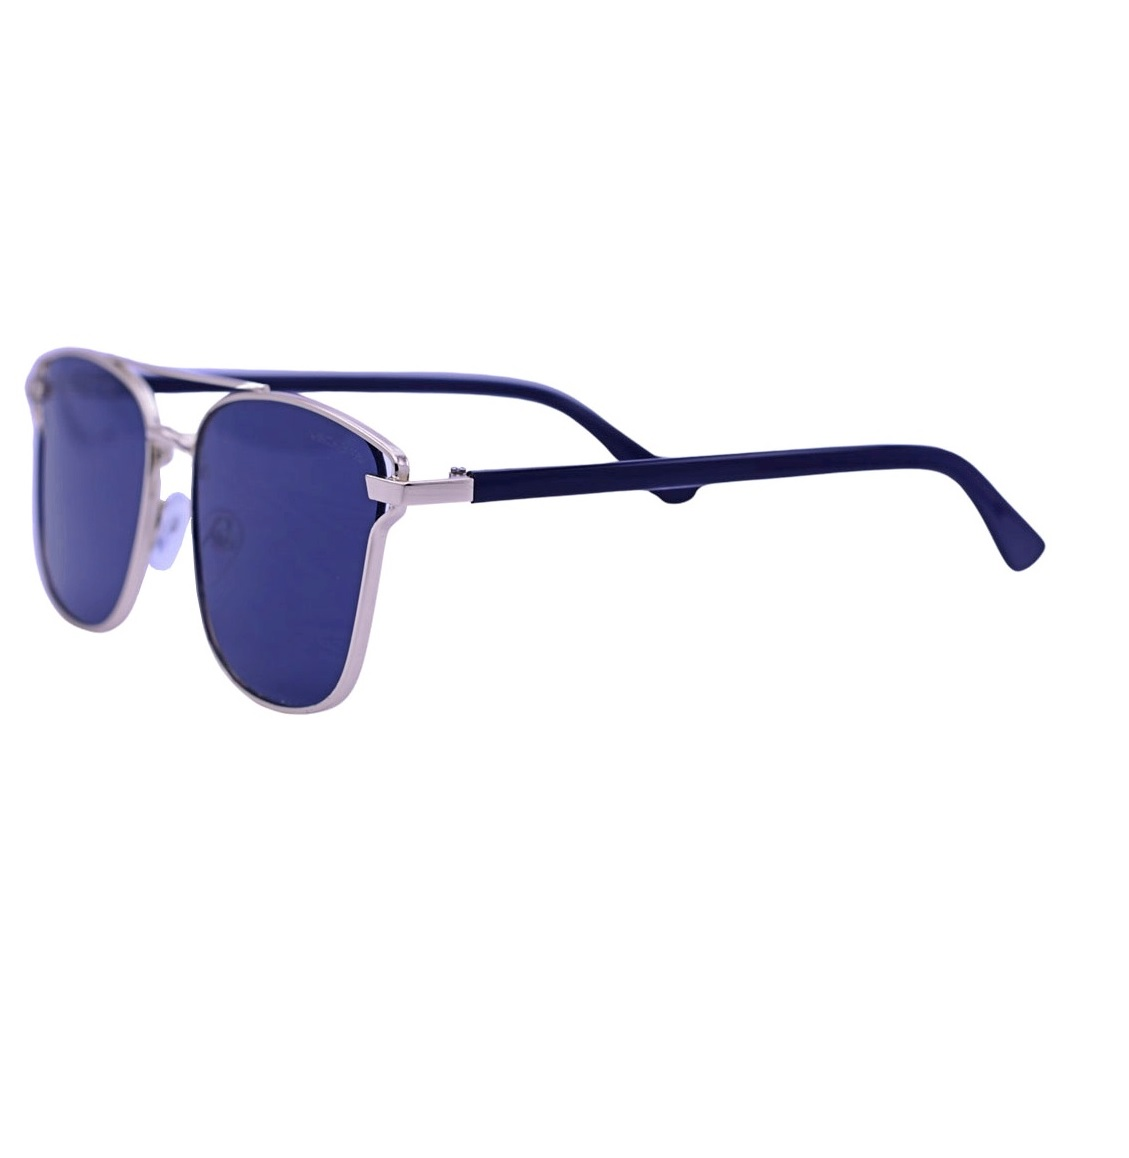 Óculos De Sol Mackage Feminino Metal-Acetato Retangular - Dourado/Preto